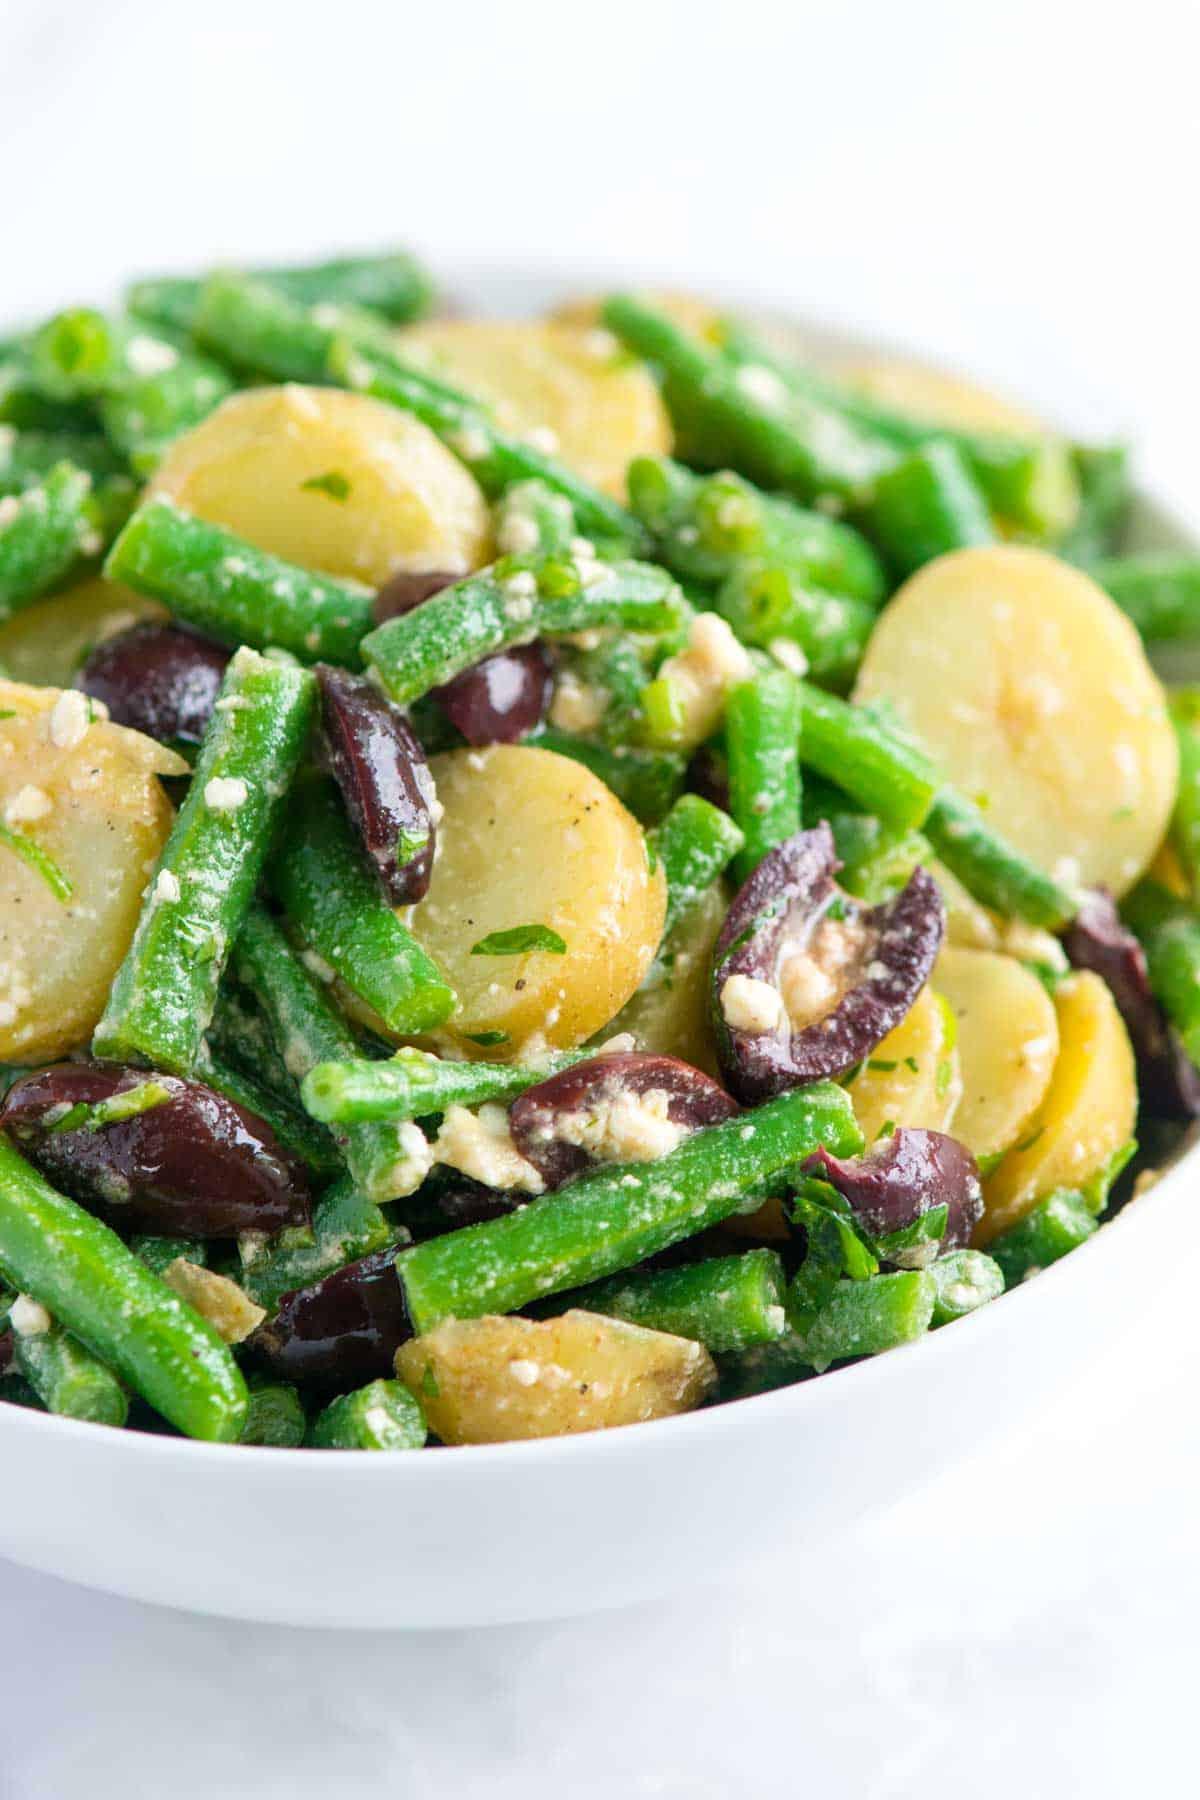 How to Make a Potato and Green Bean Salad with Feta Vinaigrette